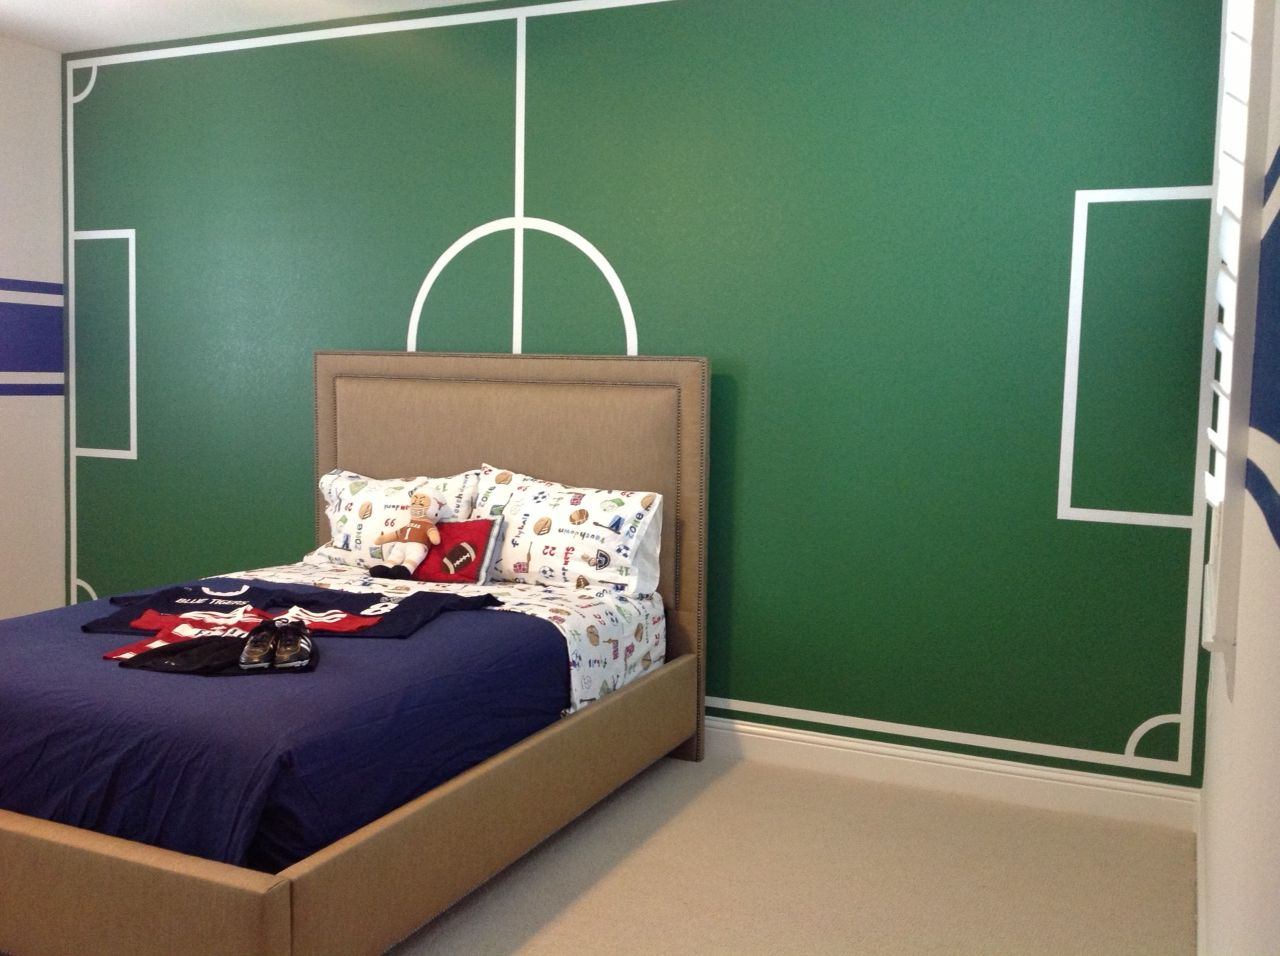 Soccer Decor For Bedroom Boys Soccer Painted Soccer Field Sports Room Kids Room Ideas